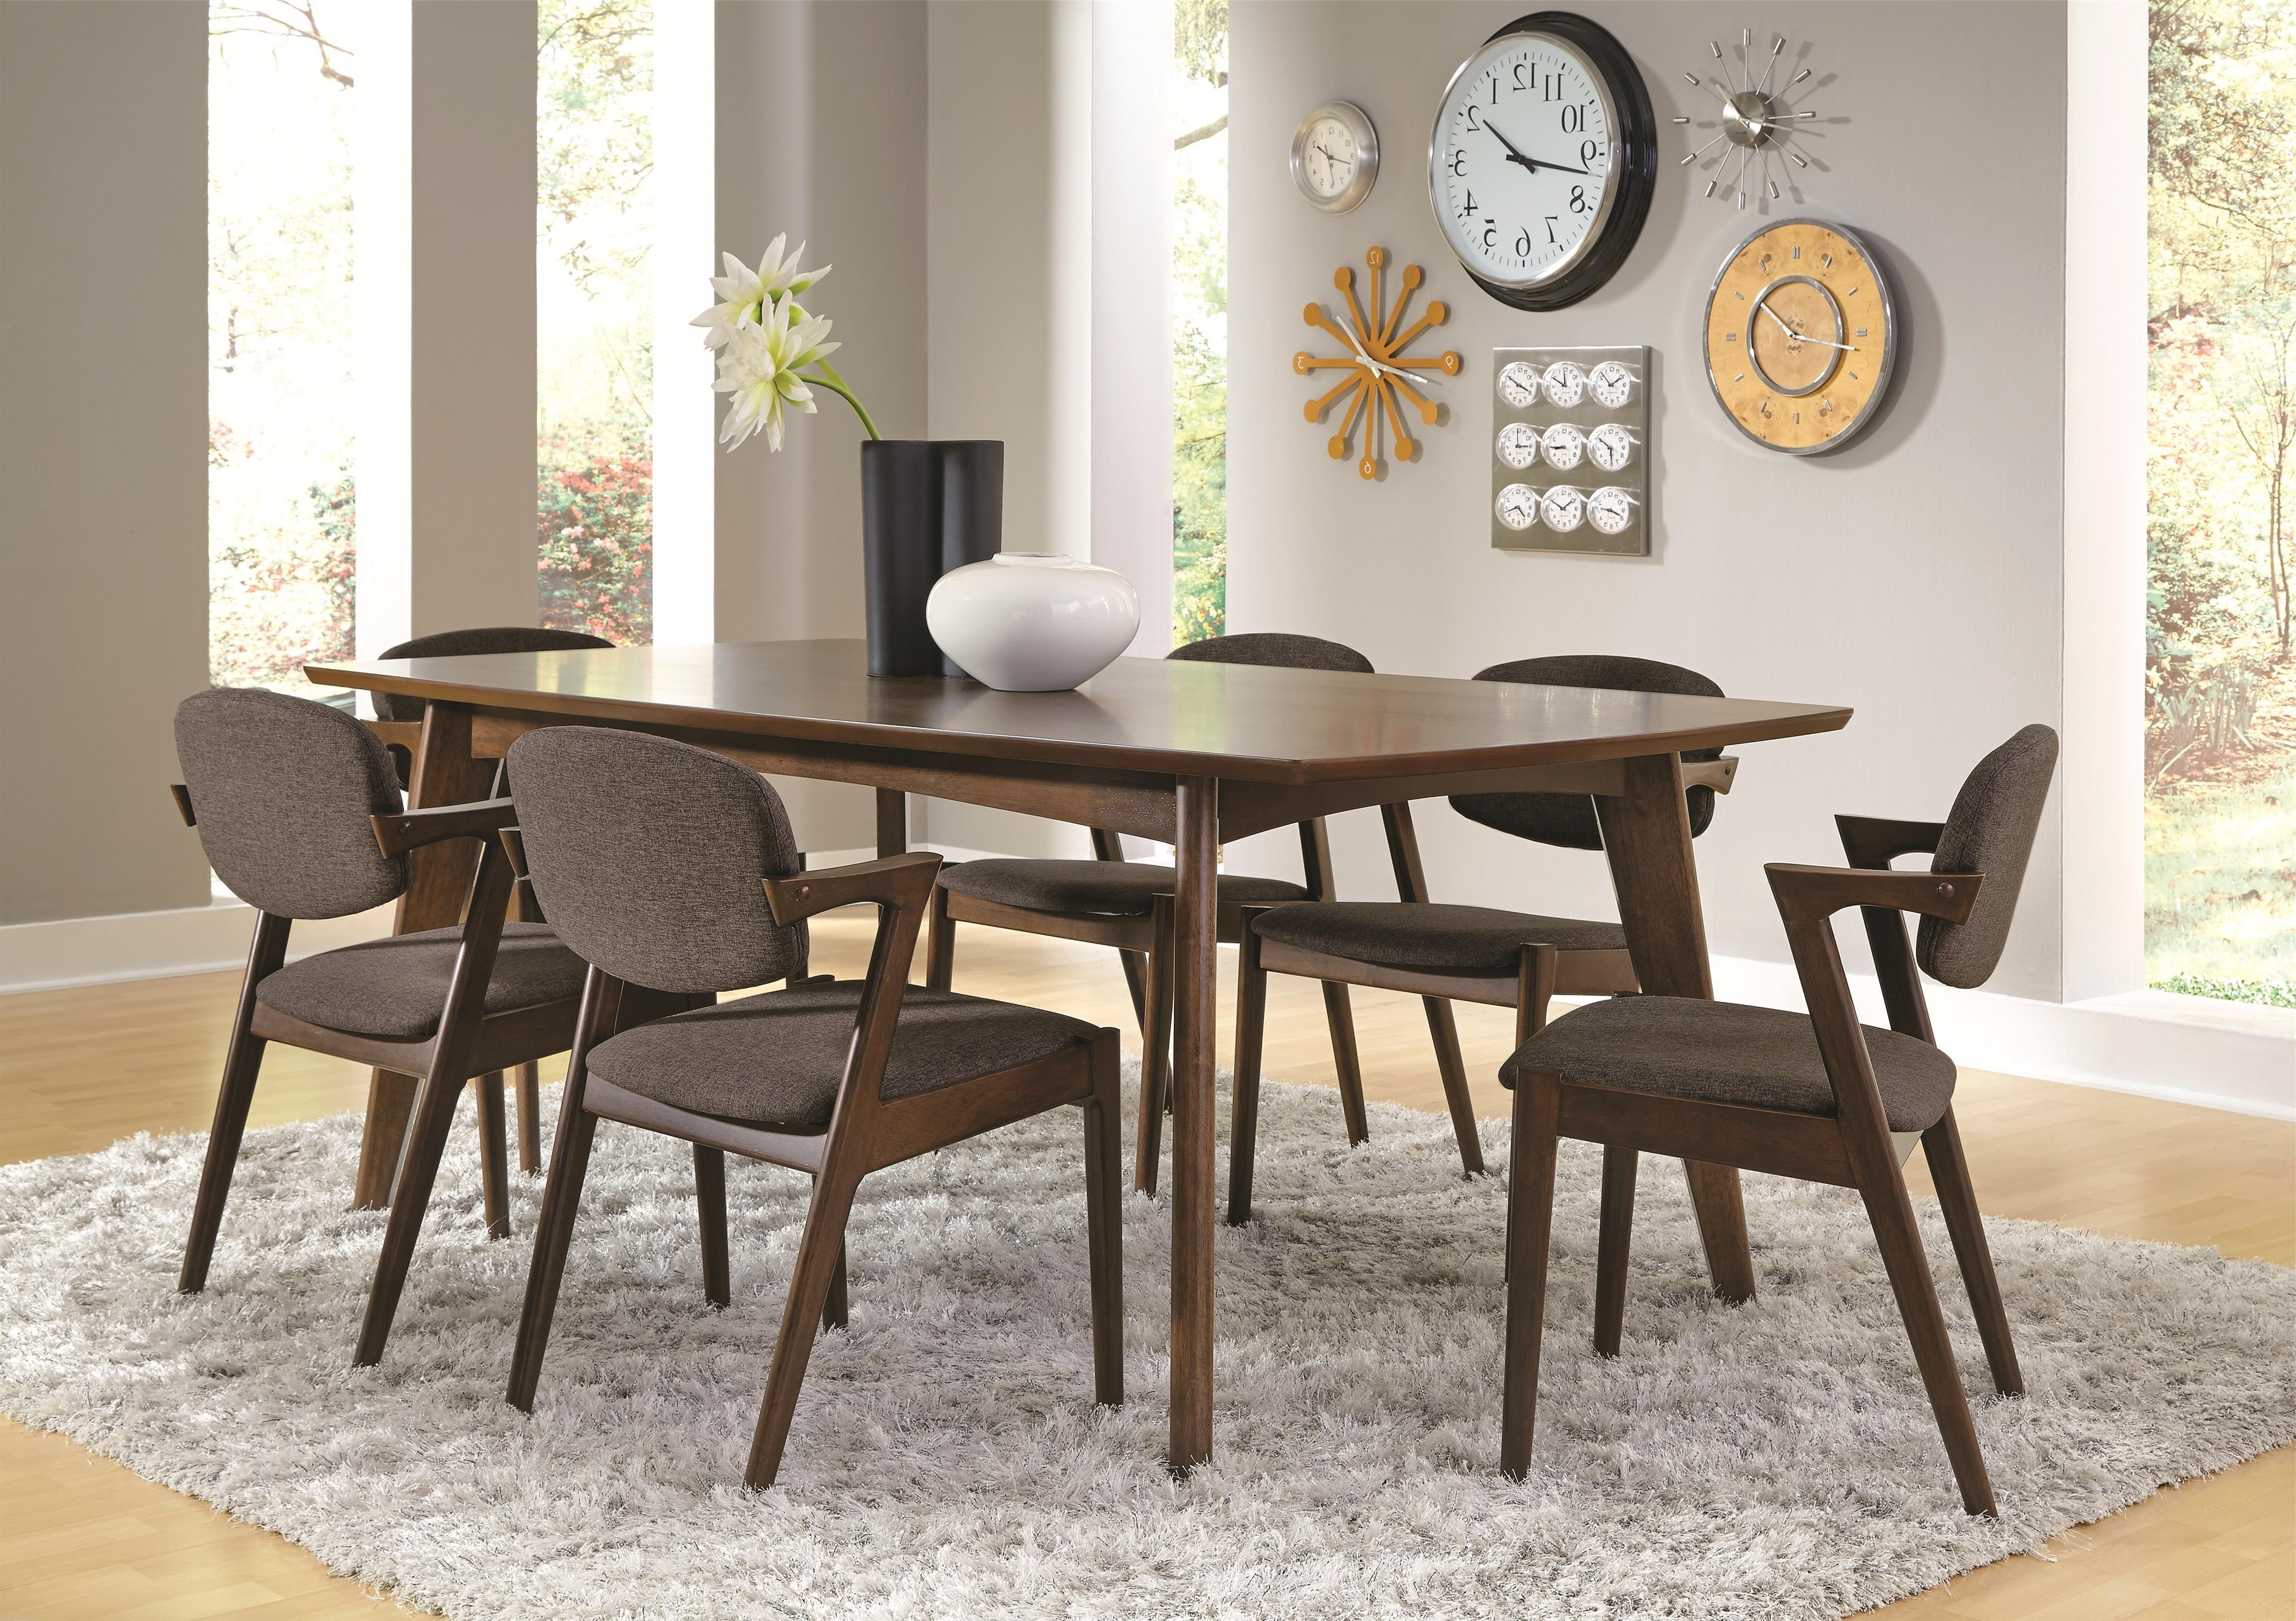 Fashionable Modern Dining Room Sets Regarding Coaster Malone Mid Century Modern 7 Piece Dining Set (View 7 of 25)